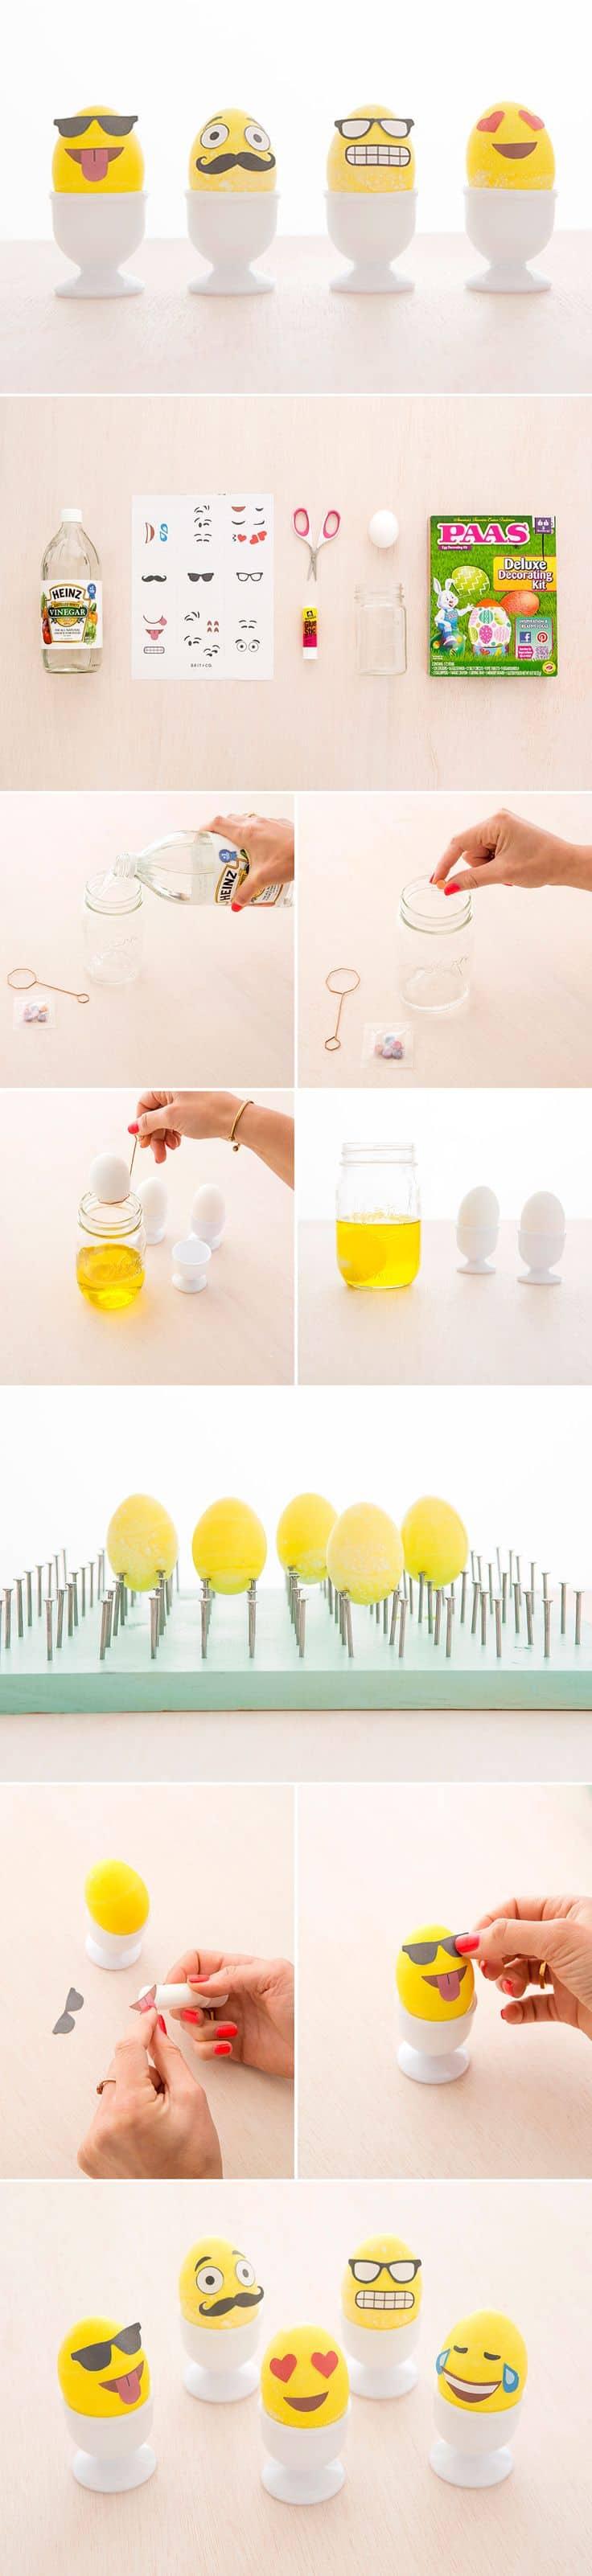 DIY Pasqua Emoticons Uova